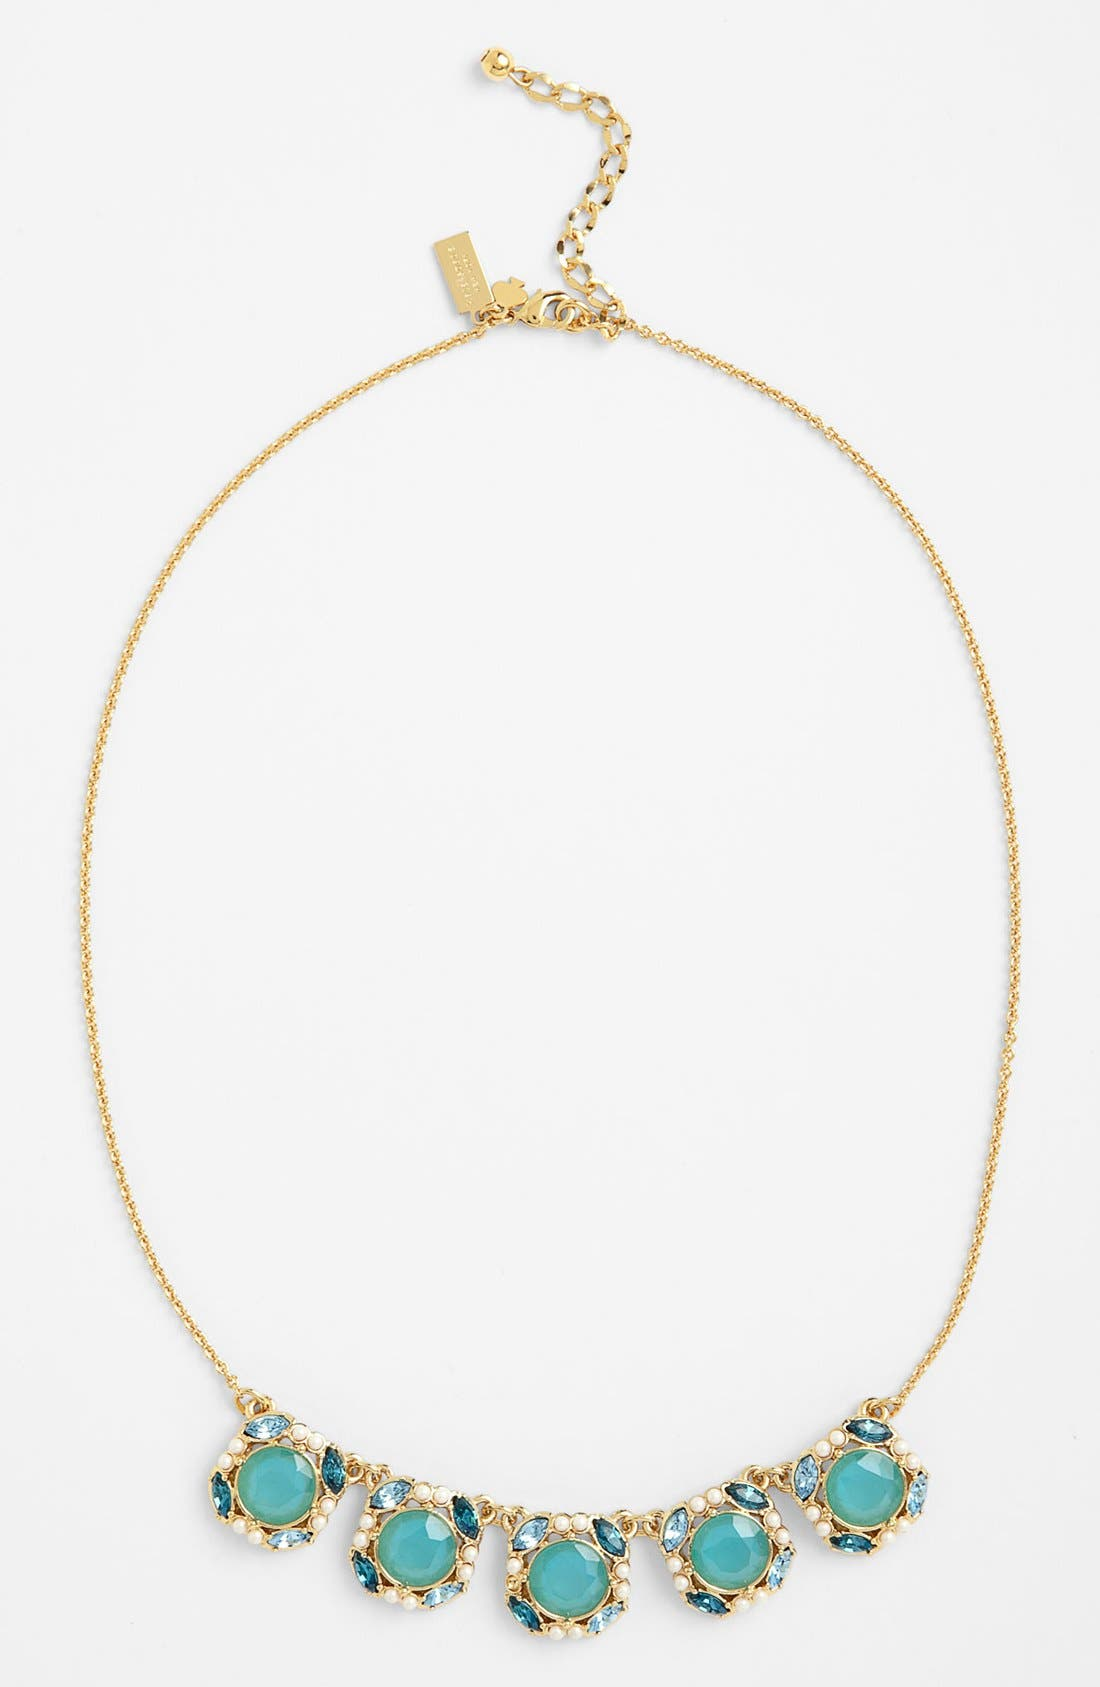 Alternate Image 1 Selected - kate spade new york 'belle fleur' frontal necklace